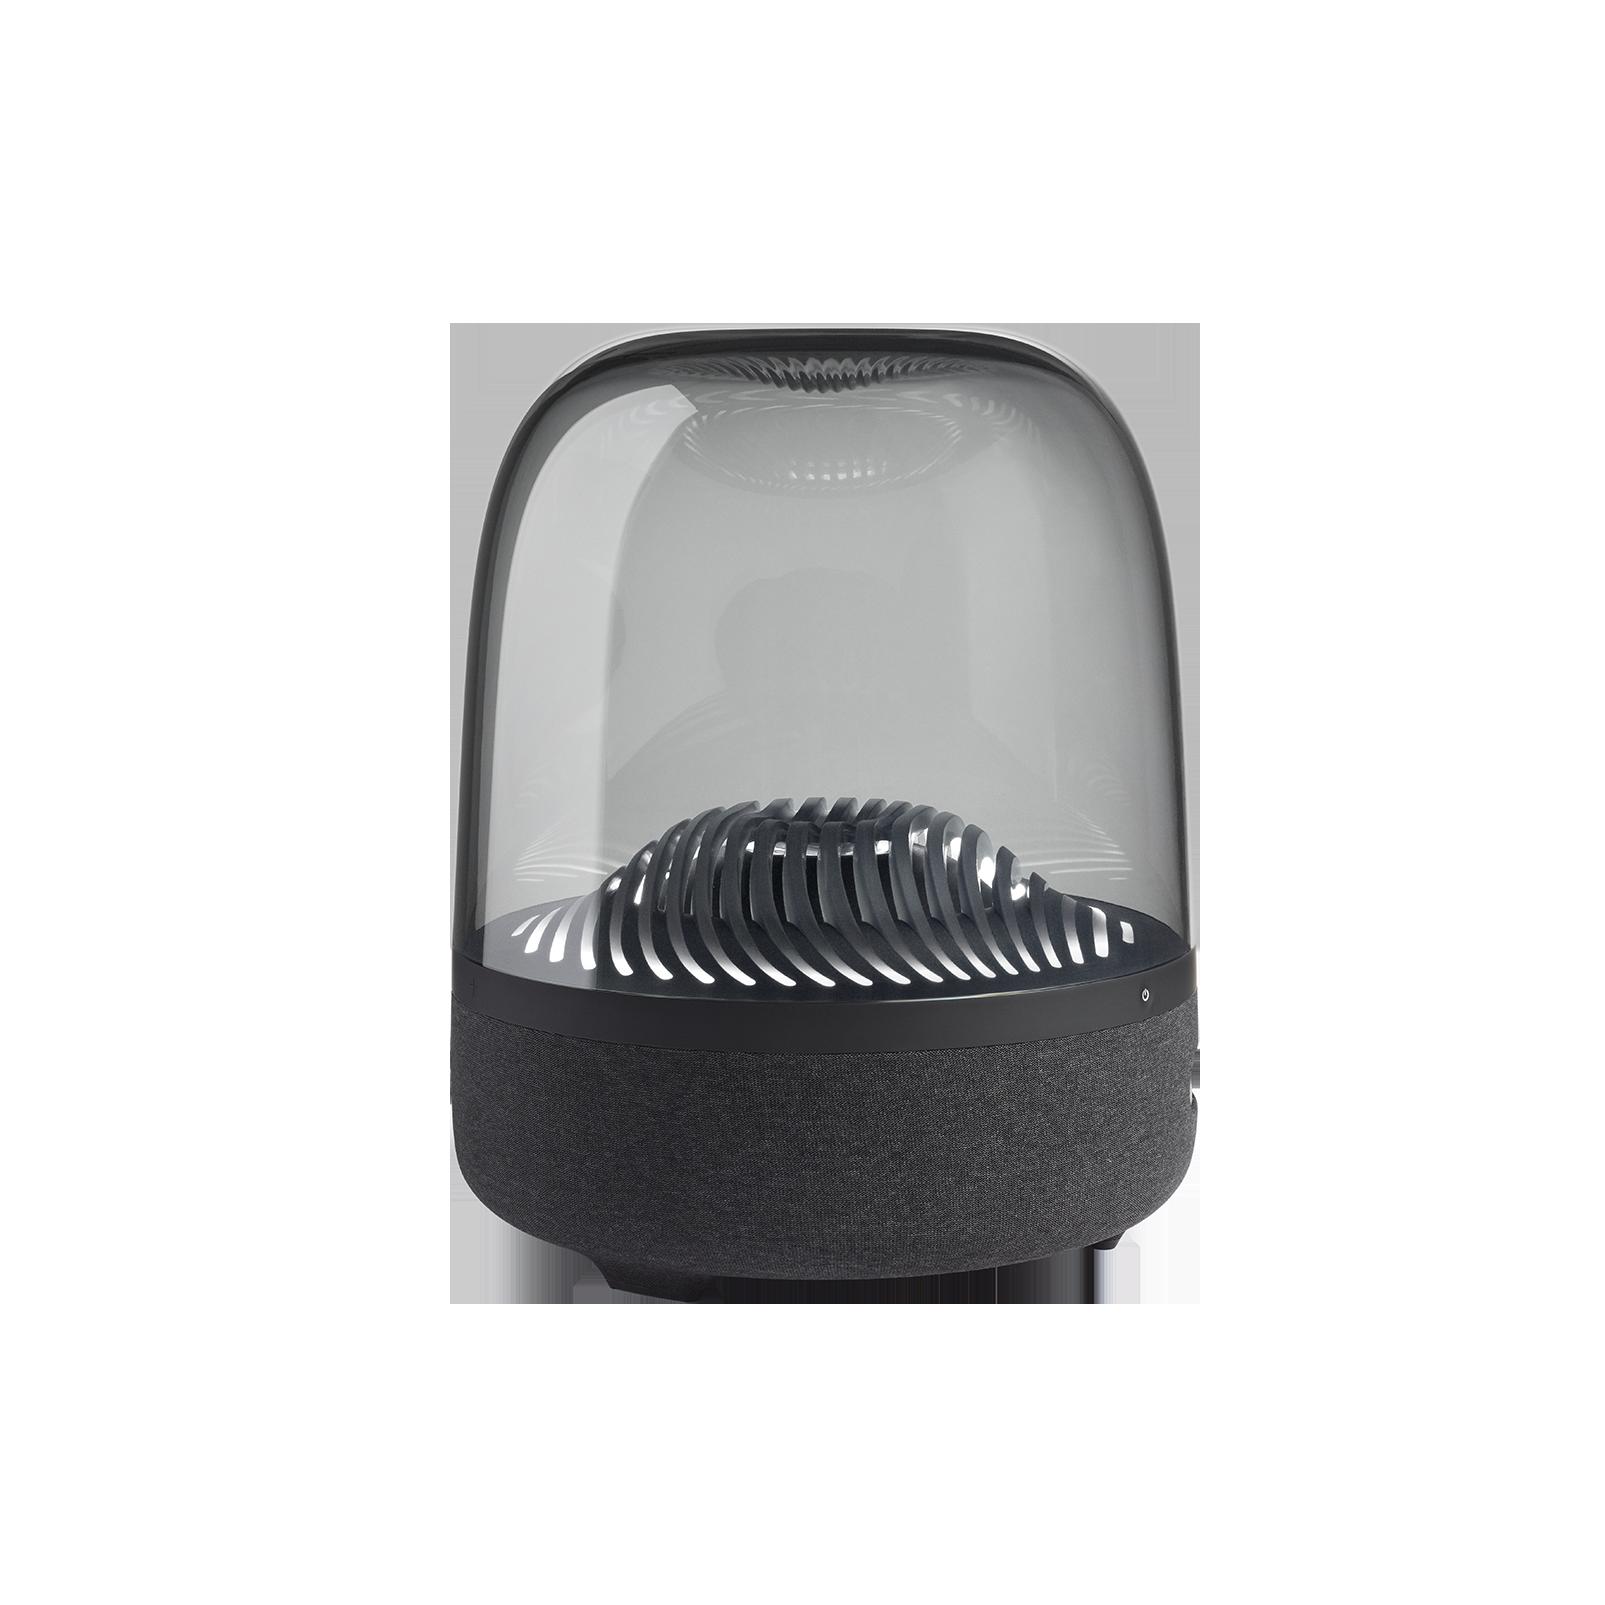 Aura Studio 3 - Black - Bluetooth speaker - Detailshot 3